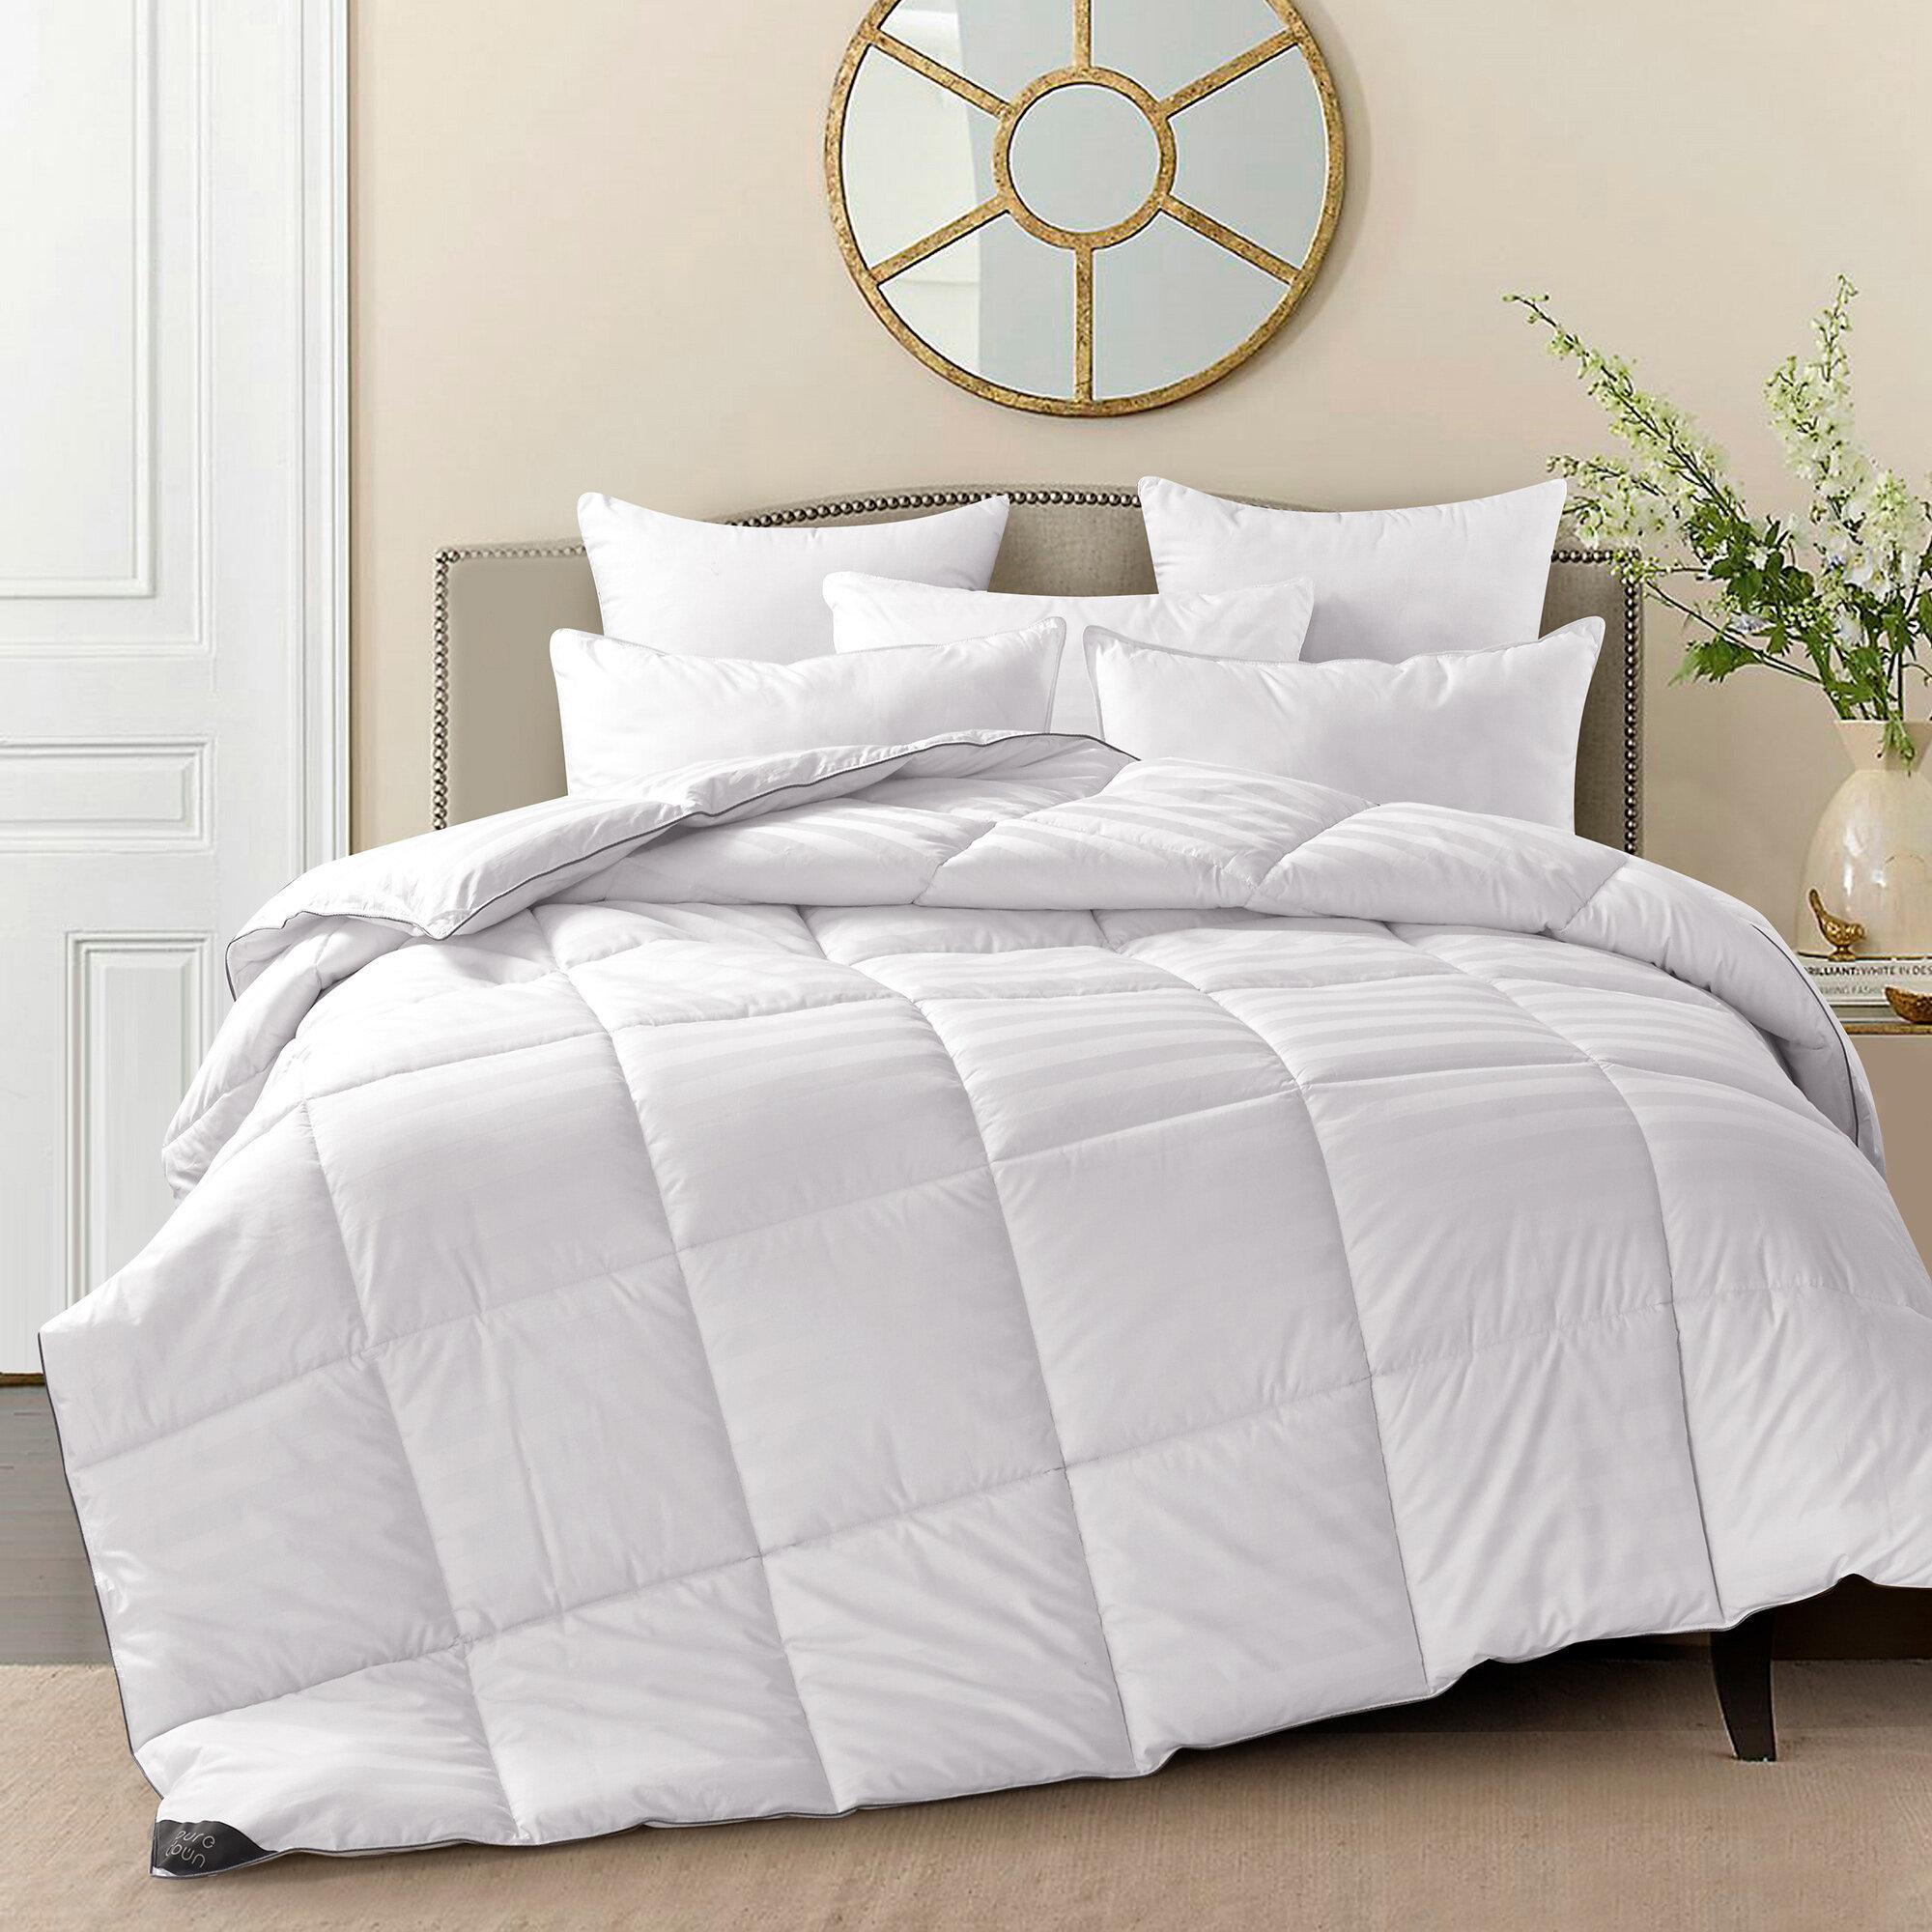 600 Fill Power All Season 75 White Down Comforter Reviews Joss Main